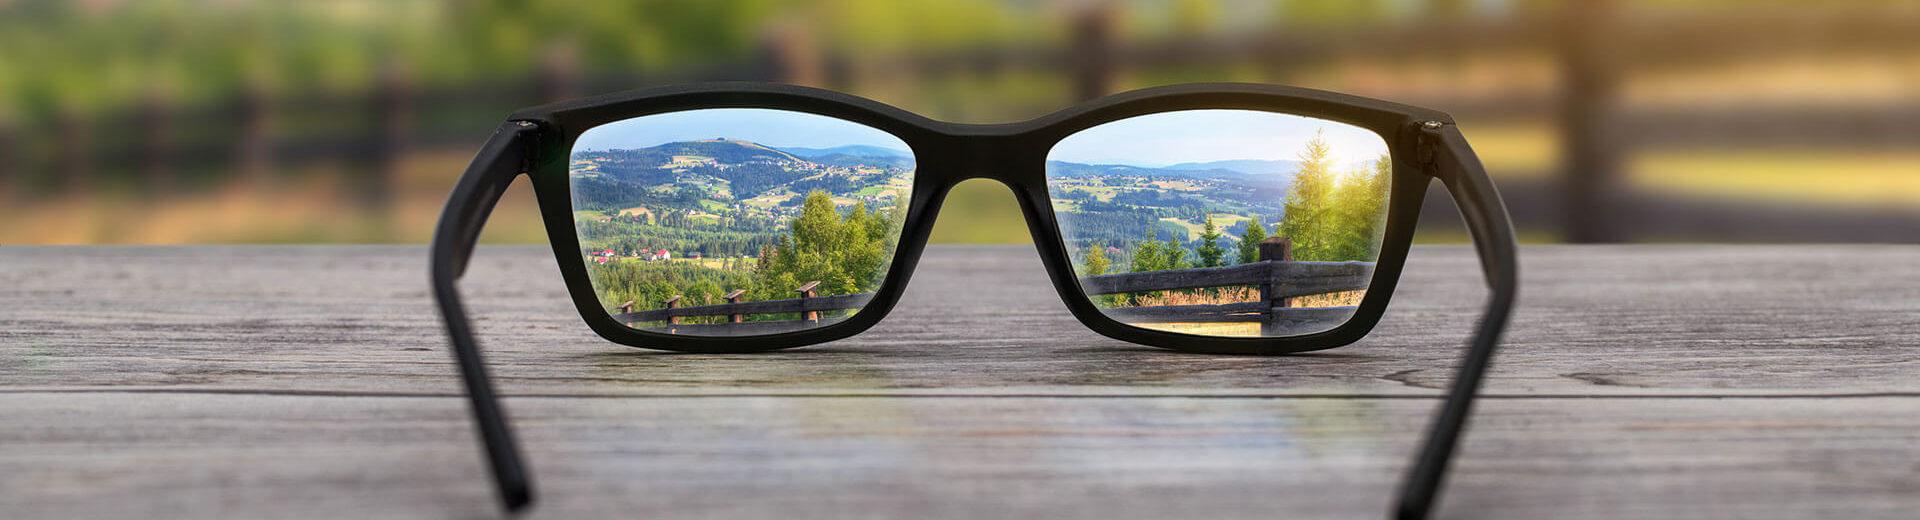 laser vision correction for myopia